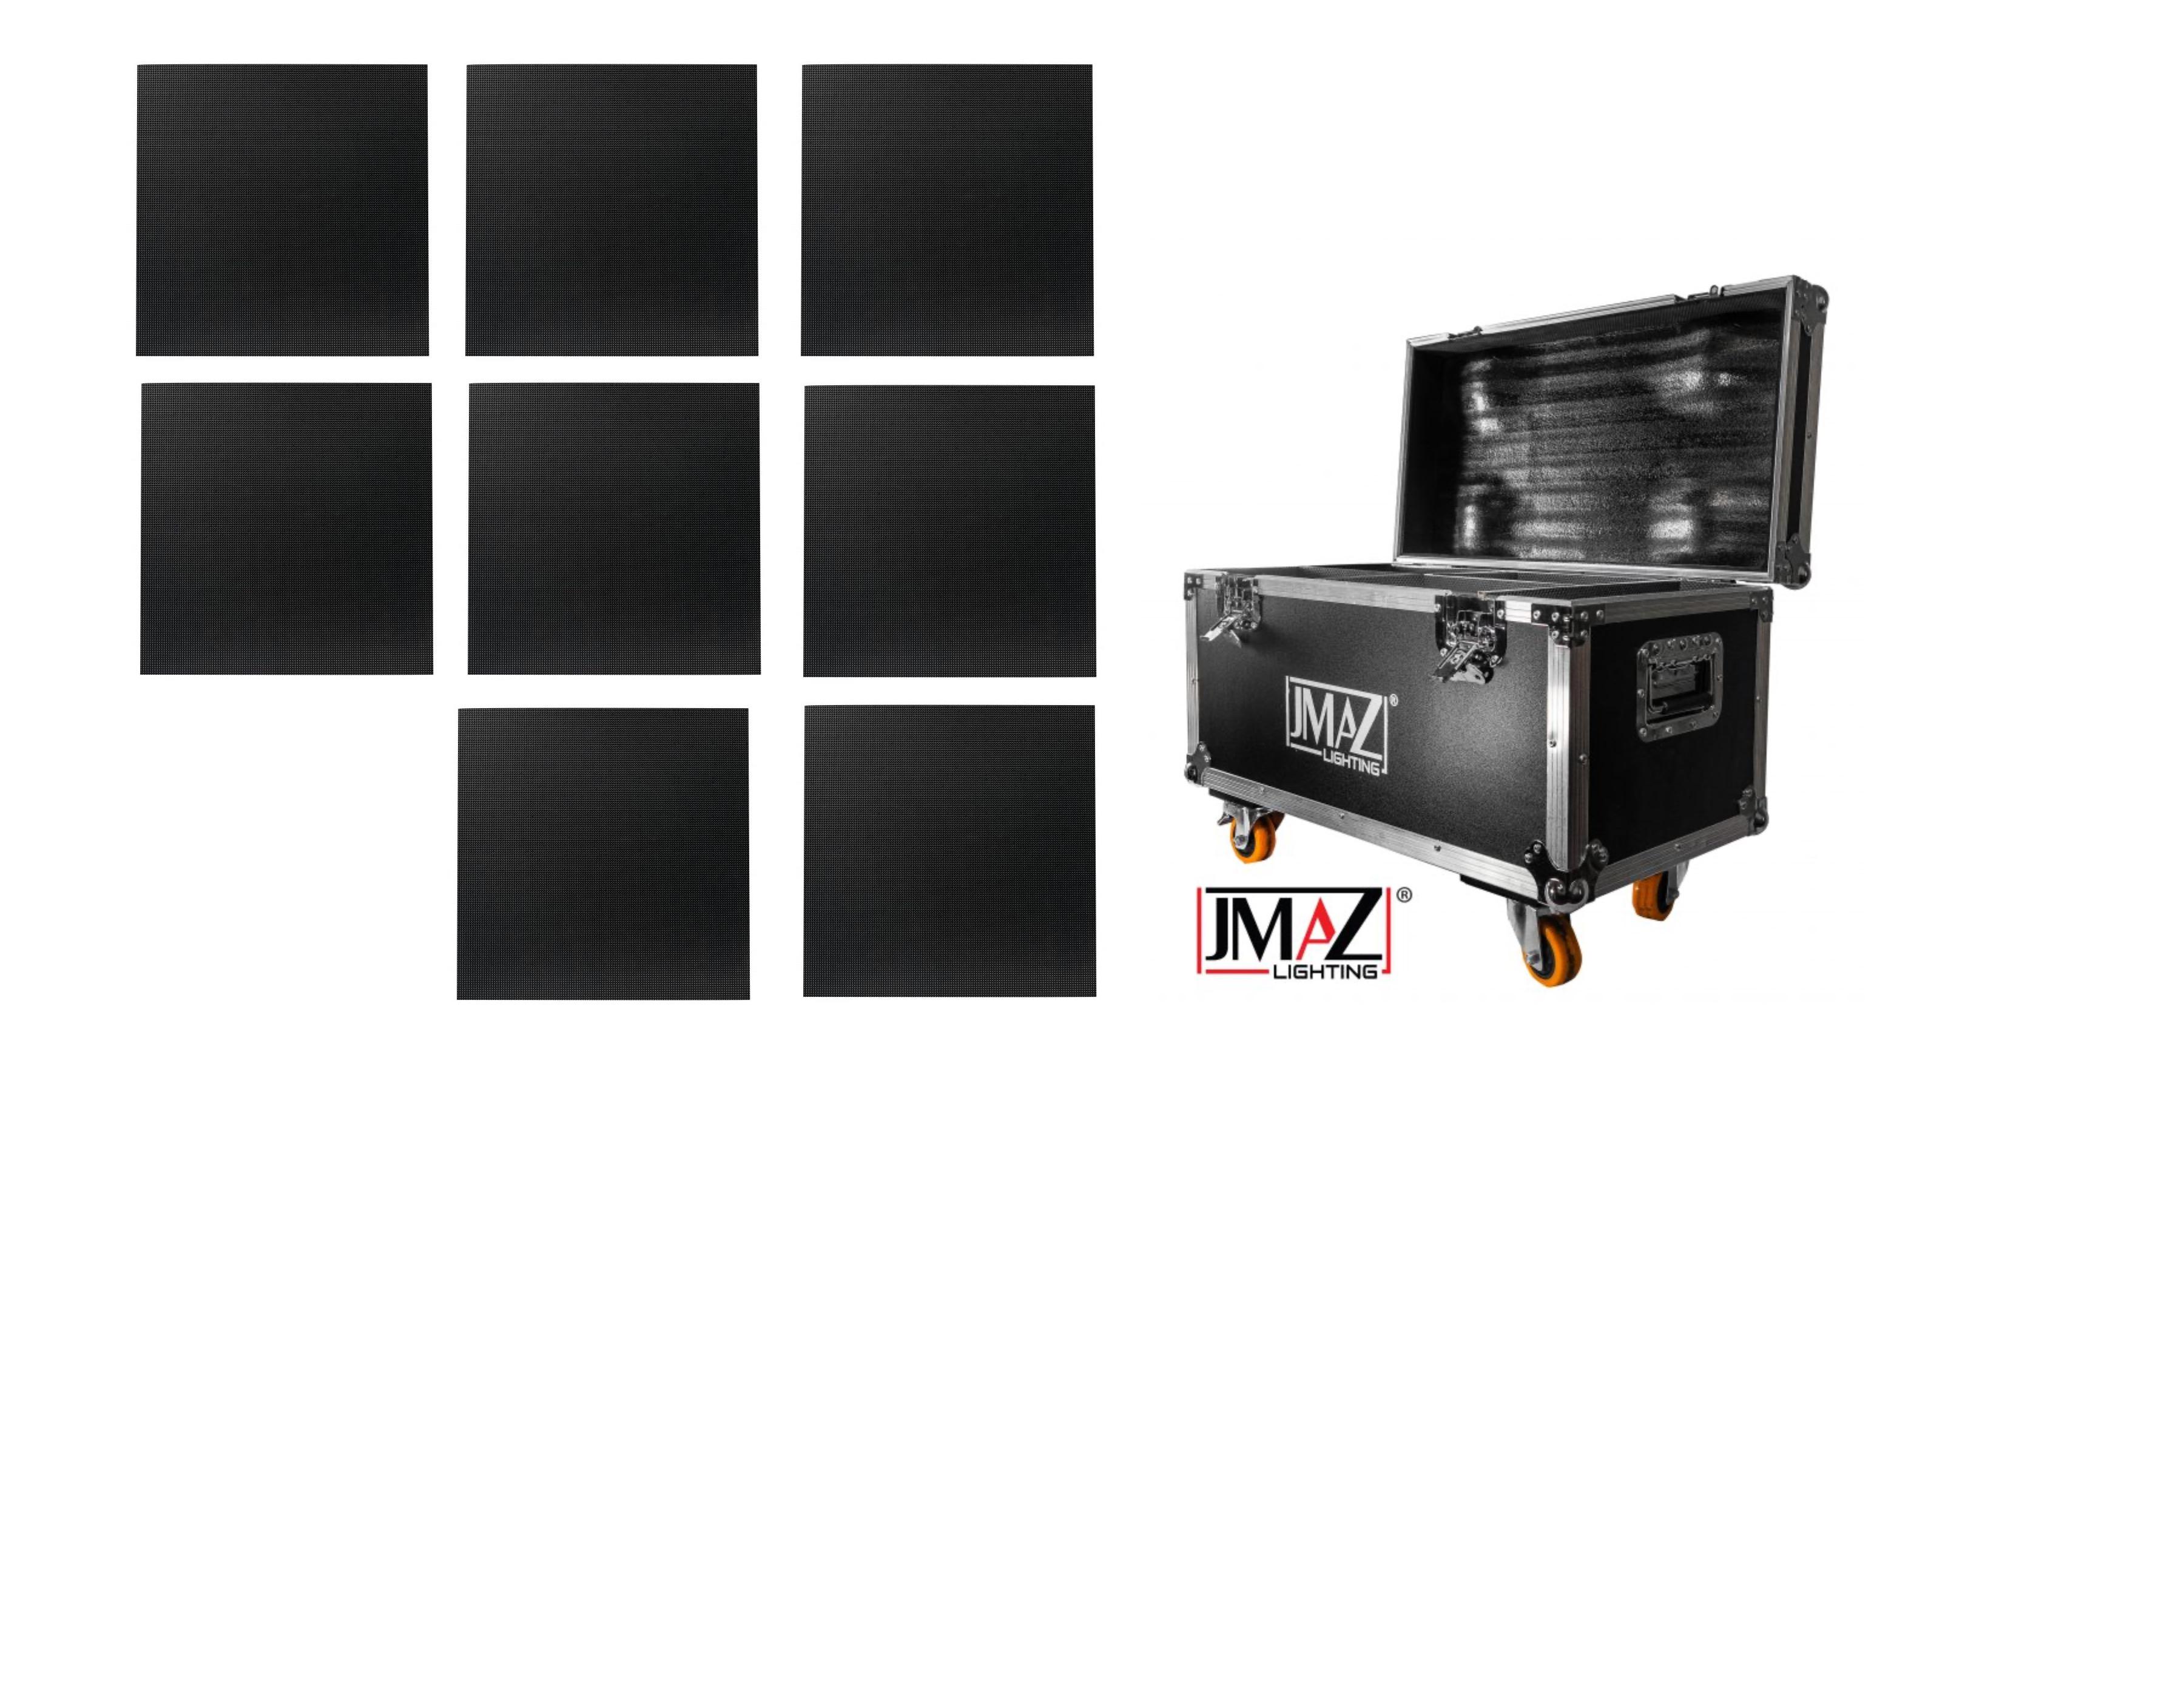 jmaz-j2-8-led-video-wall-package.jpeg